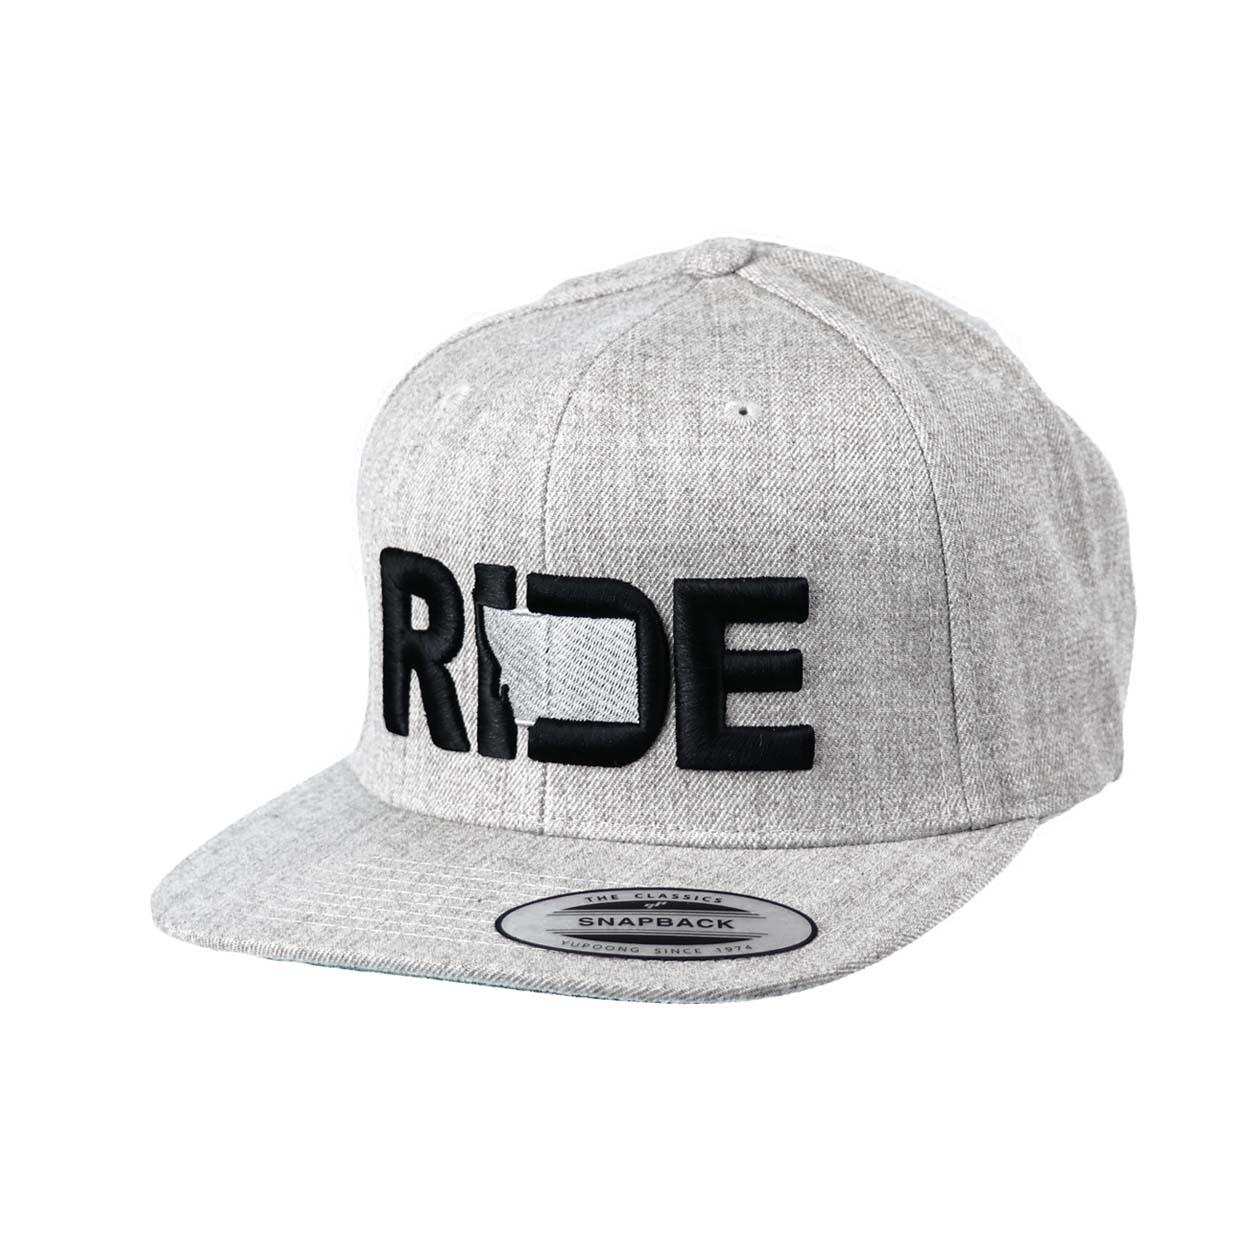 Ride Montana Classic Embroidered  Snapback Flat Brim Hat Gray/Black